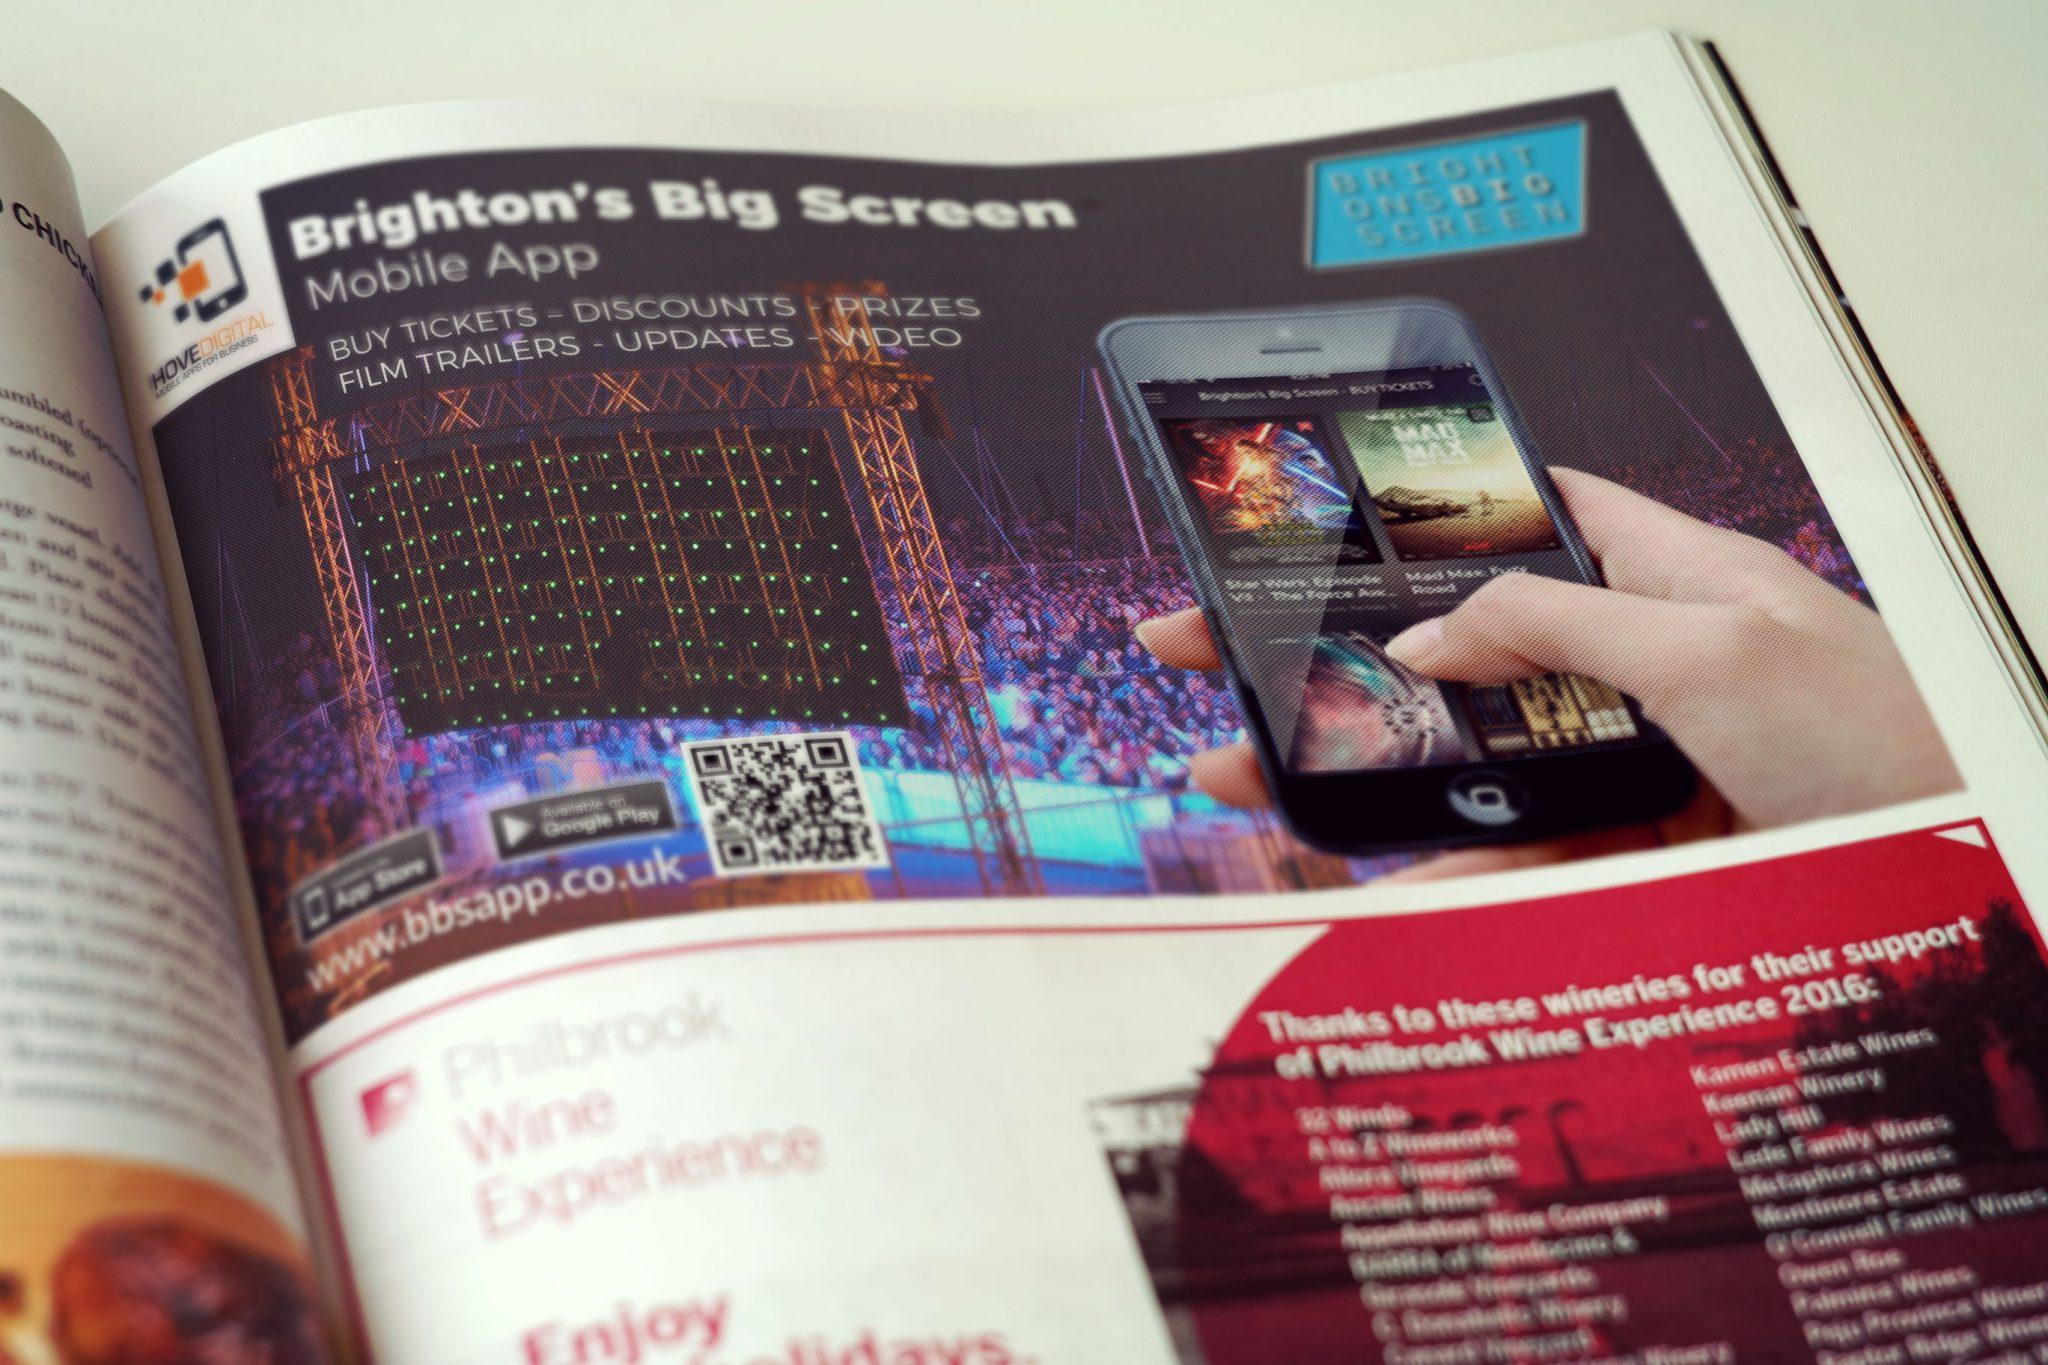 Magazine Advert – Brighton's Big Screen